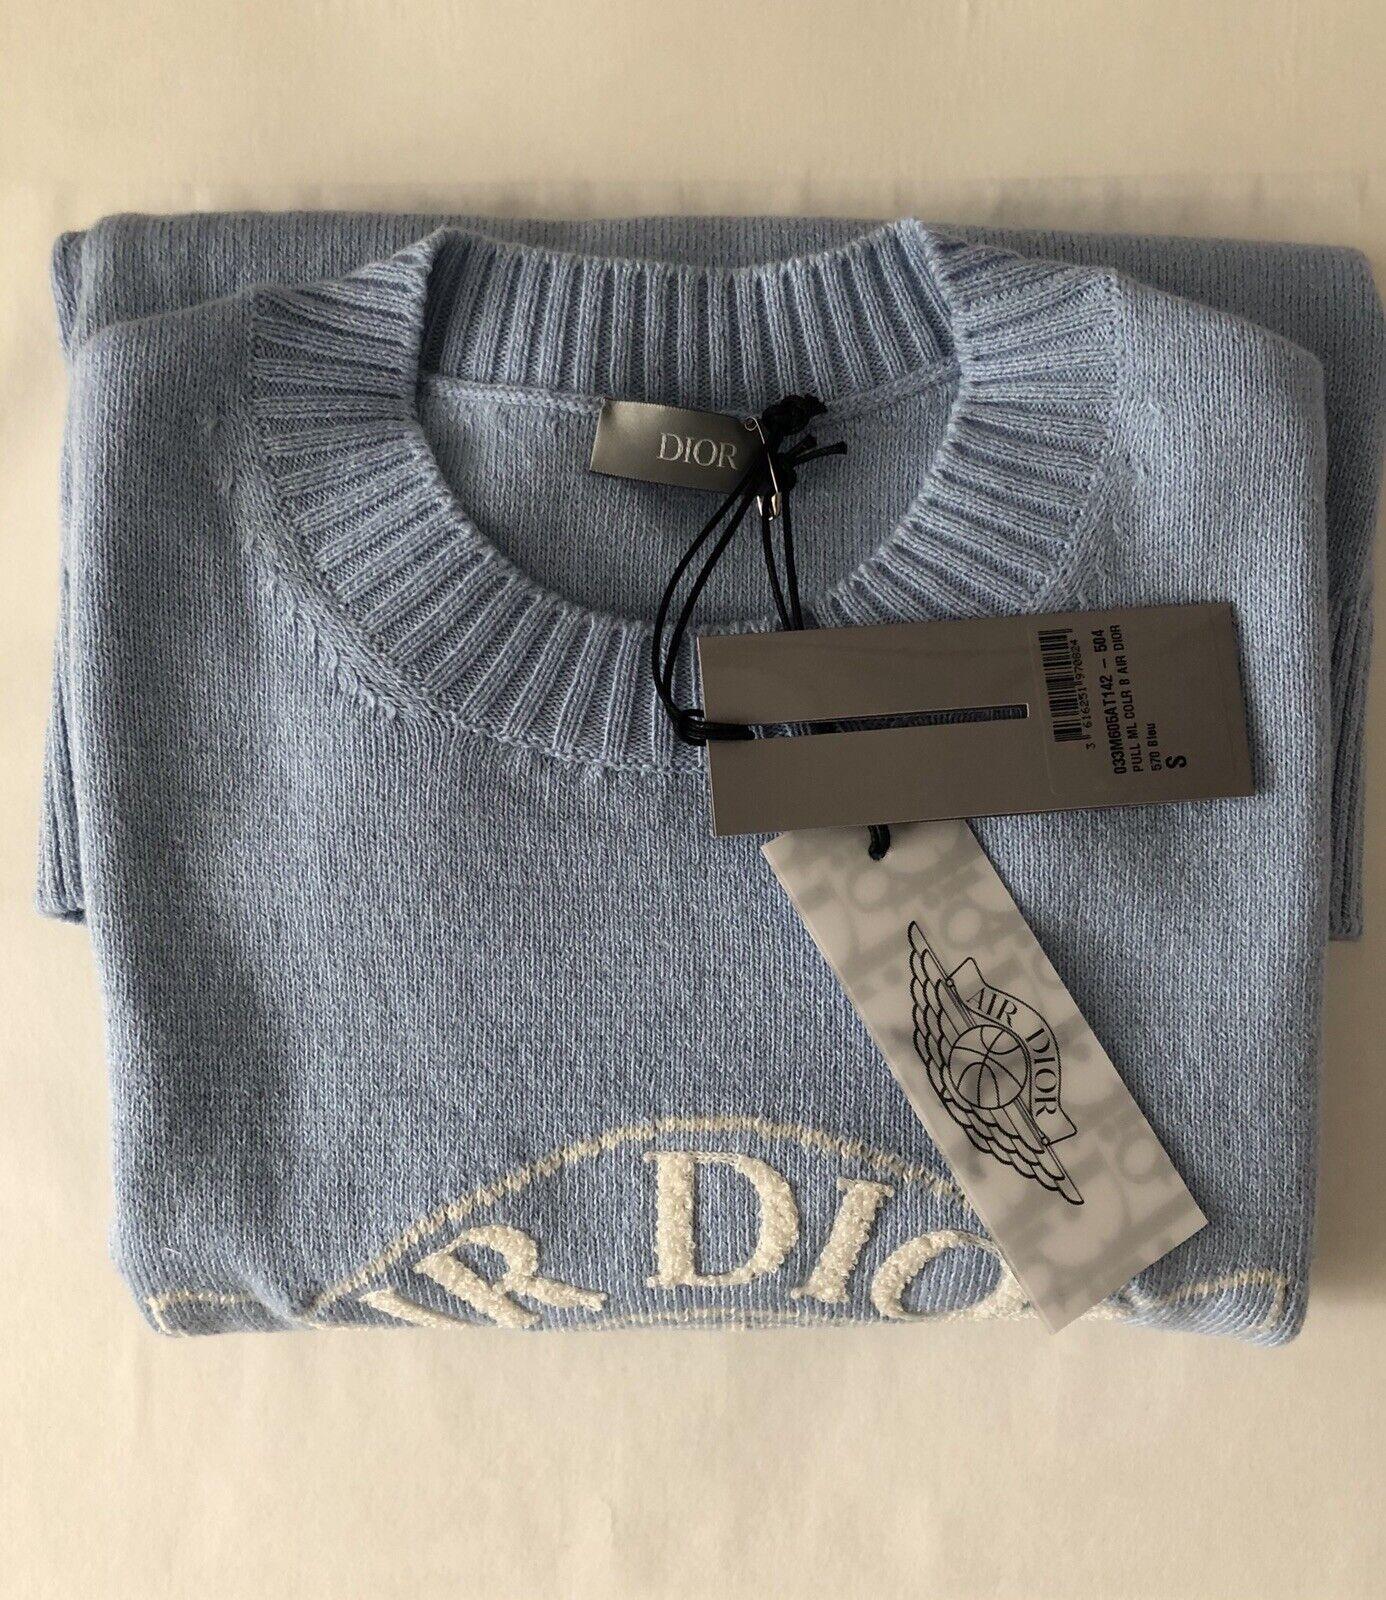 Air Dior Wings x Jordan1 Dior Sweater Blue Rare Colour Way Size S BNWT DS